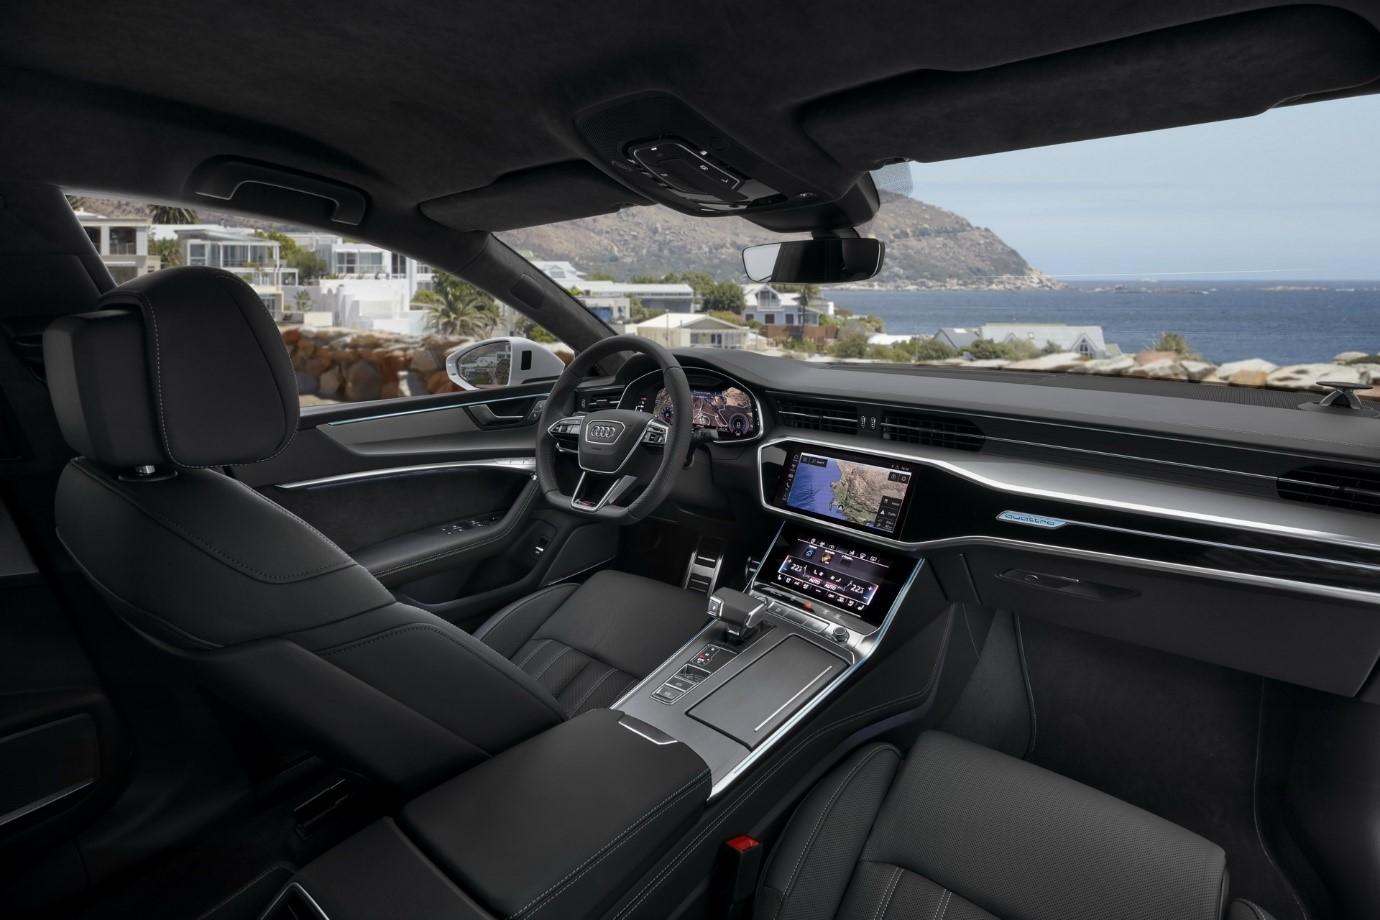 New Audi A7 Sportback [UK] - MS+ BLOG